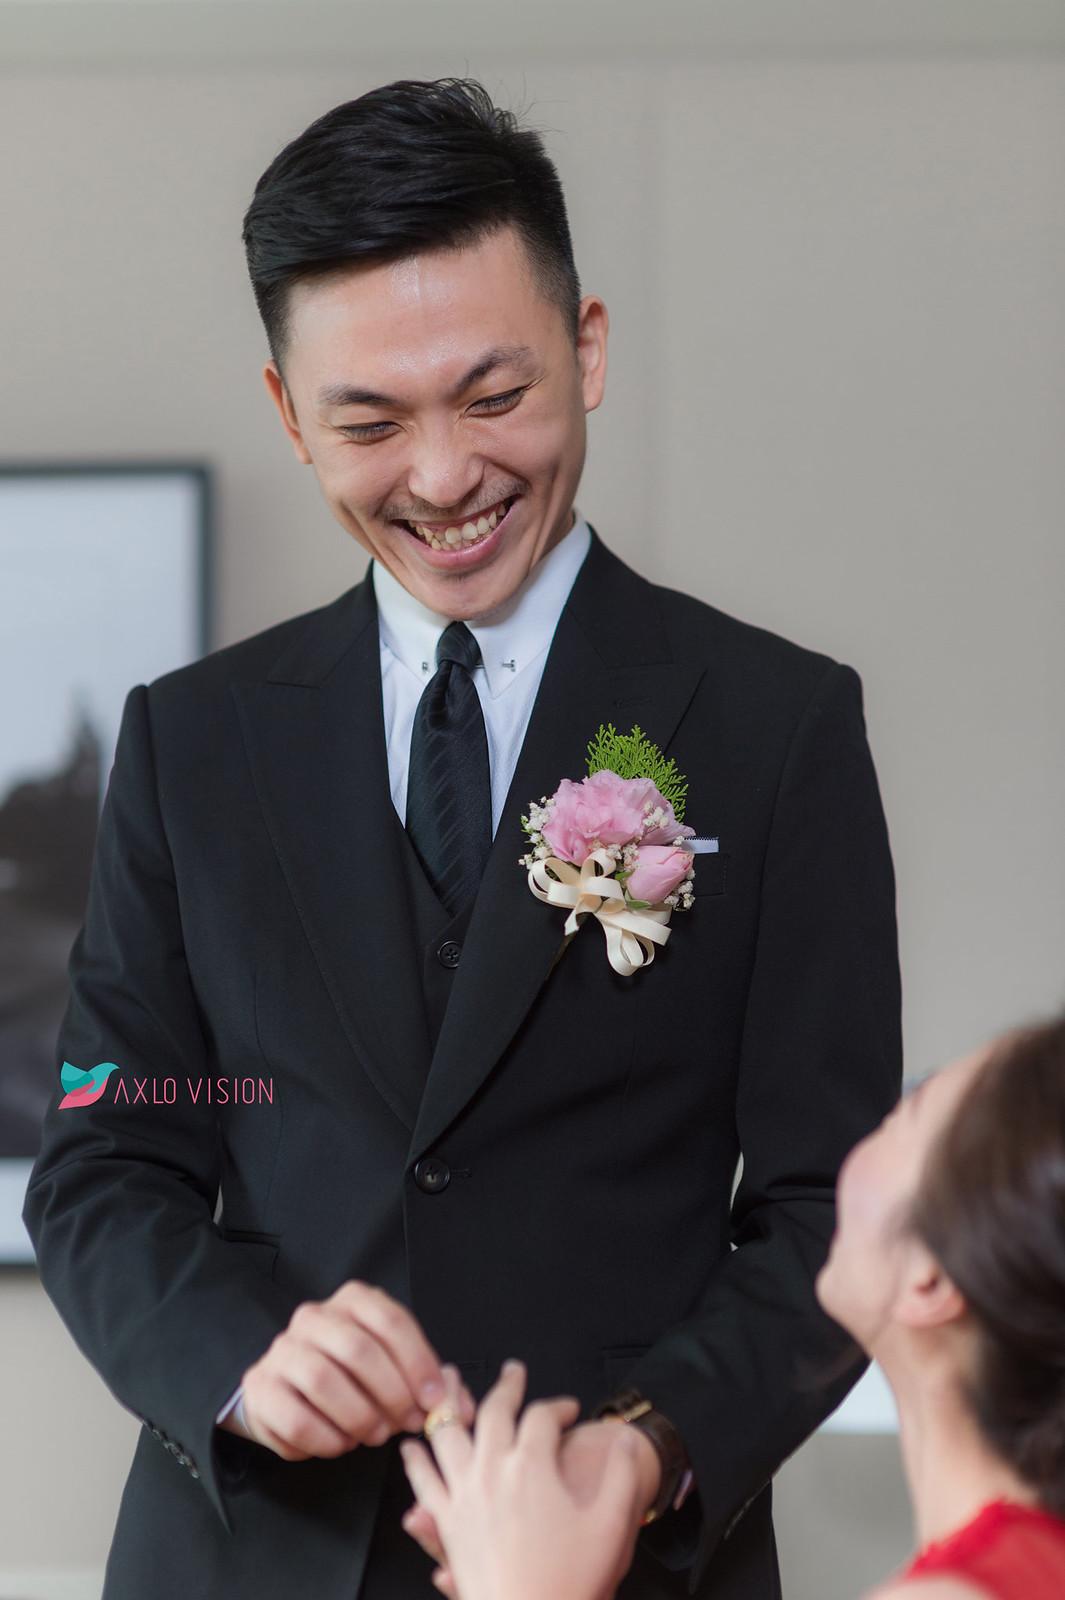 20170916 WeddingDay_033